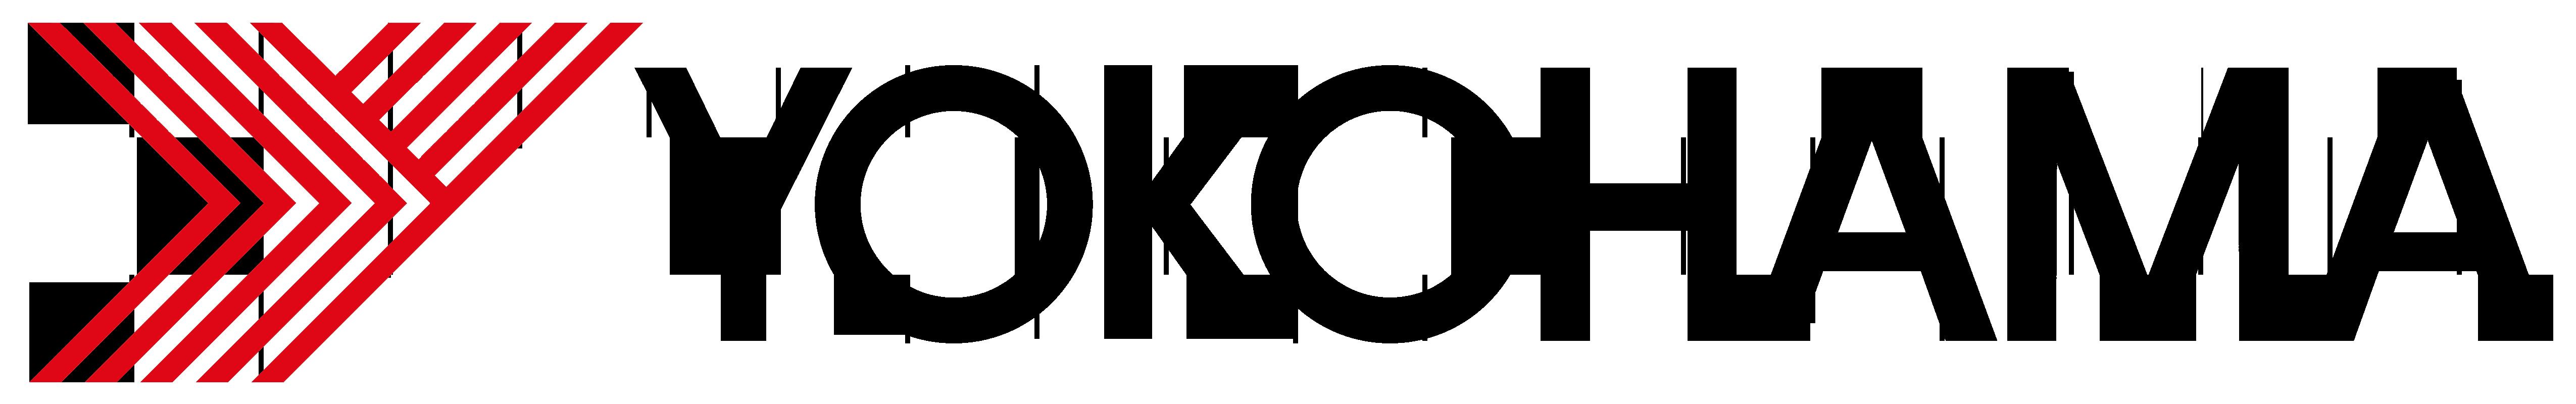 Yokohama-logo-5100x800-1.png